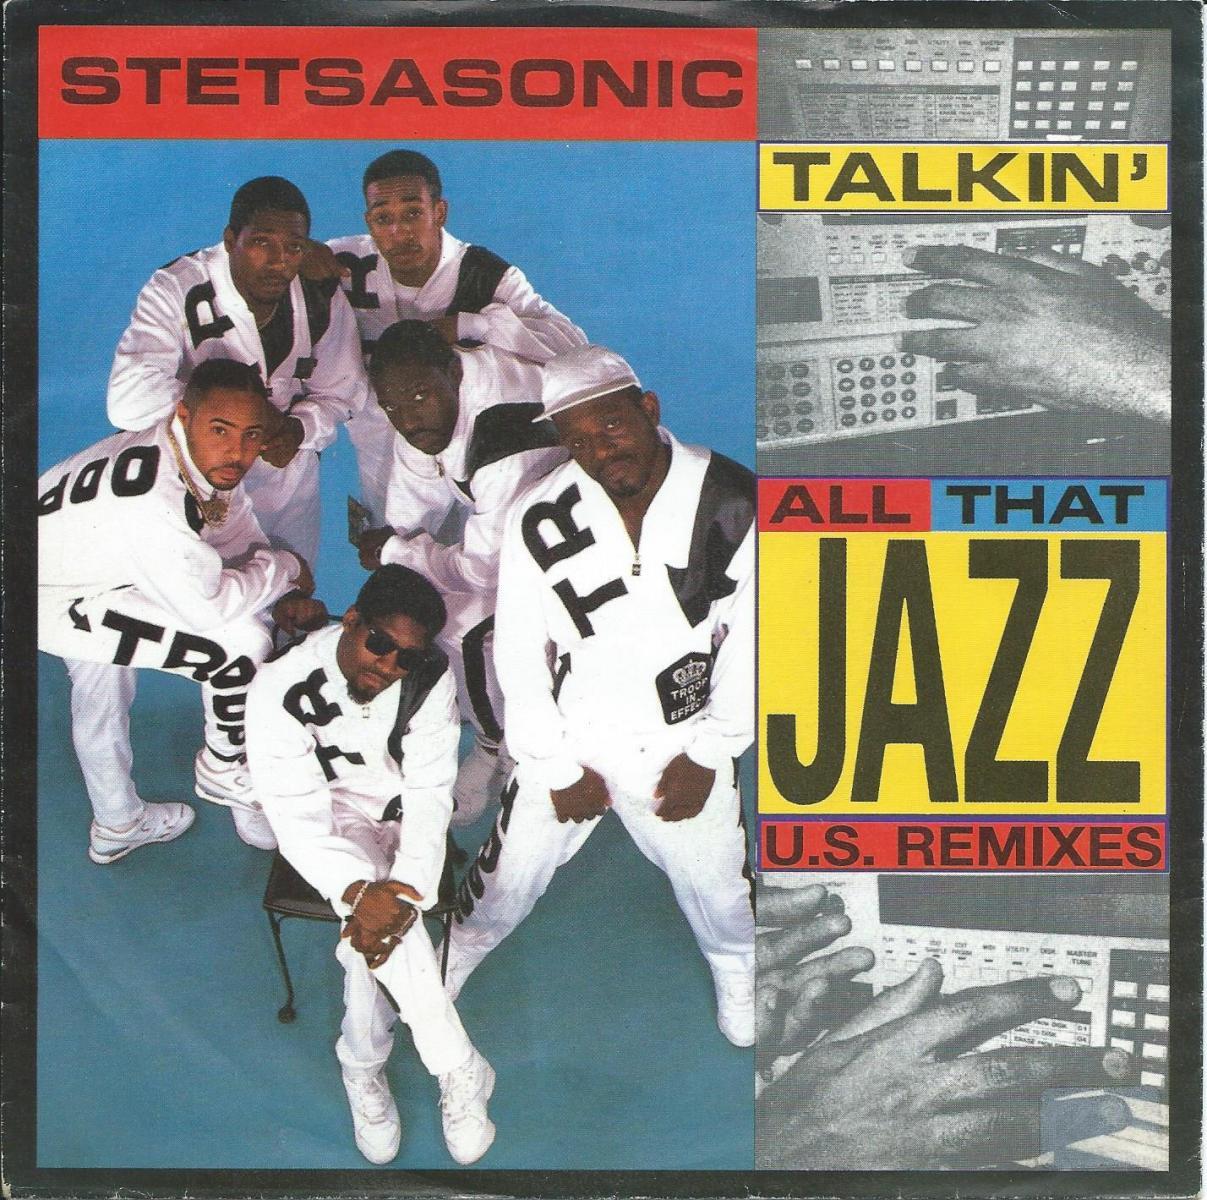 STETSASONIC / TALKIN' ALL THAT JAZZ U.S. REMIXES (7